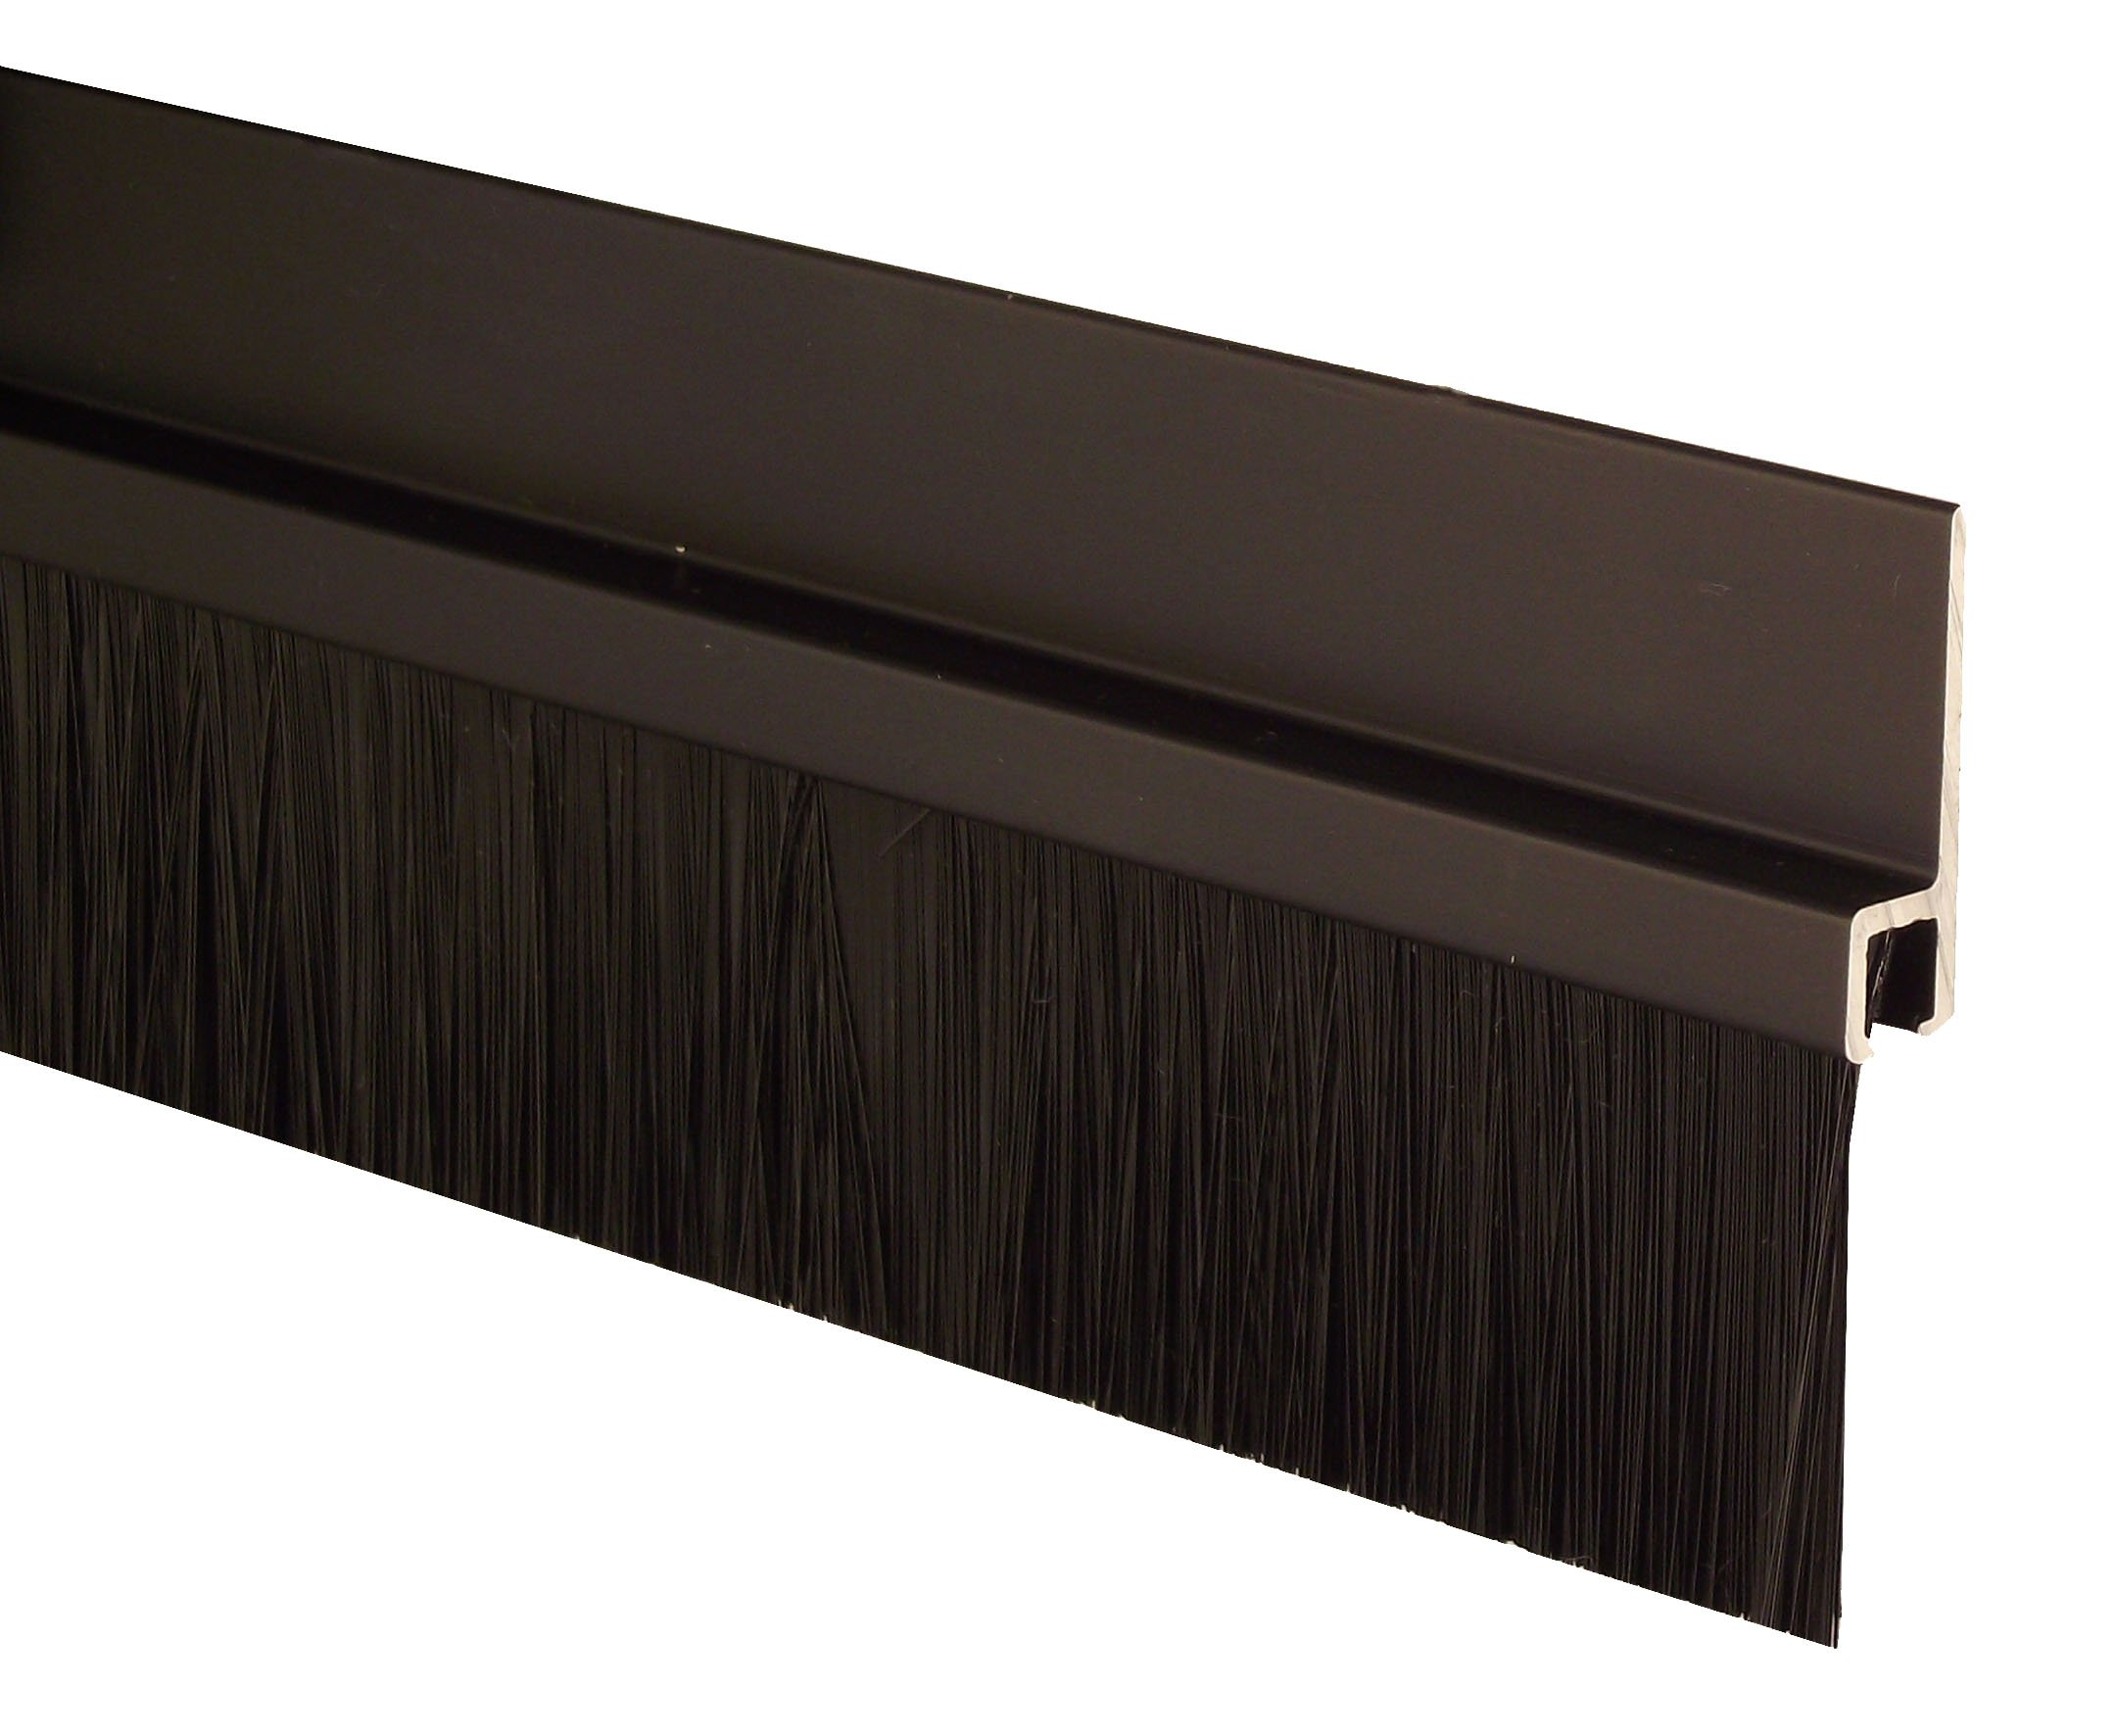 "Pemko Aluminum and Nylon Door Bristle Weatherstrip, Dark Anodized, 1/4""W x 36""L x 1-7/8""H"